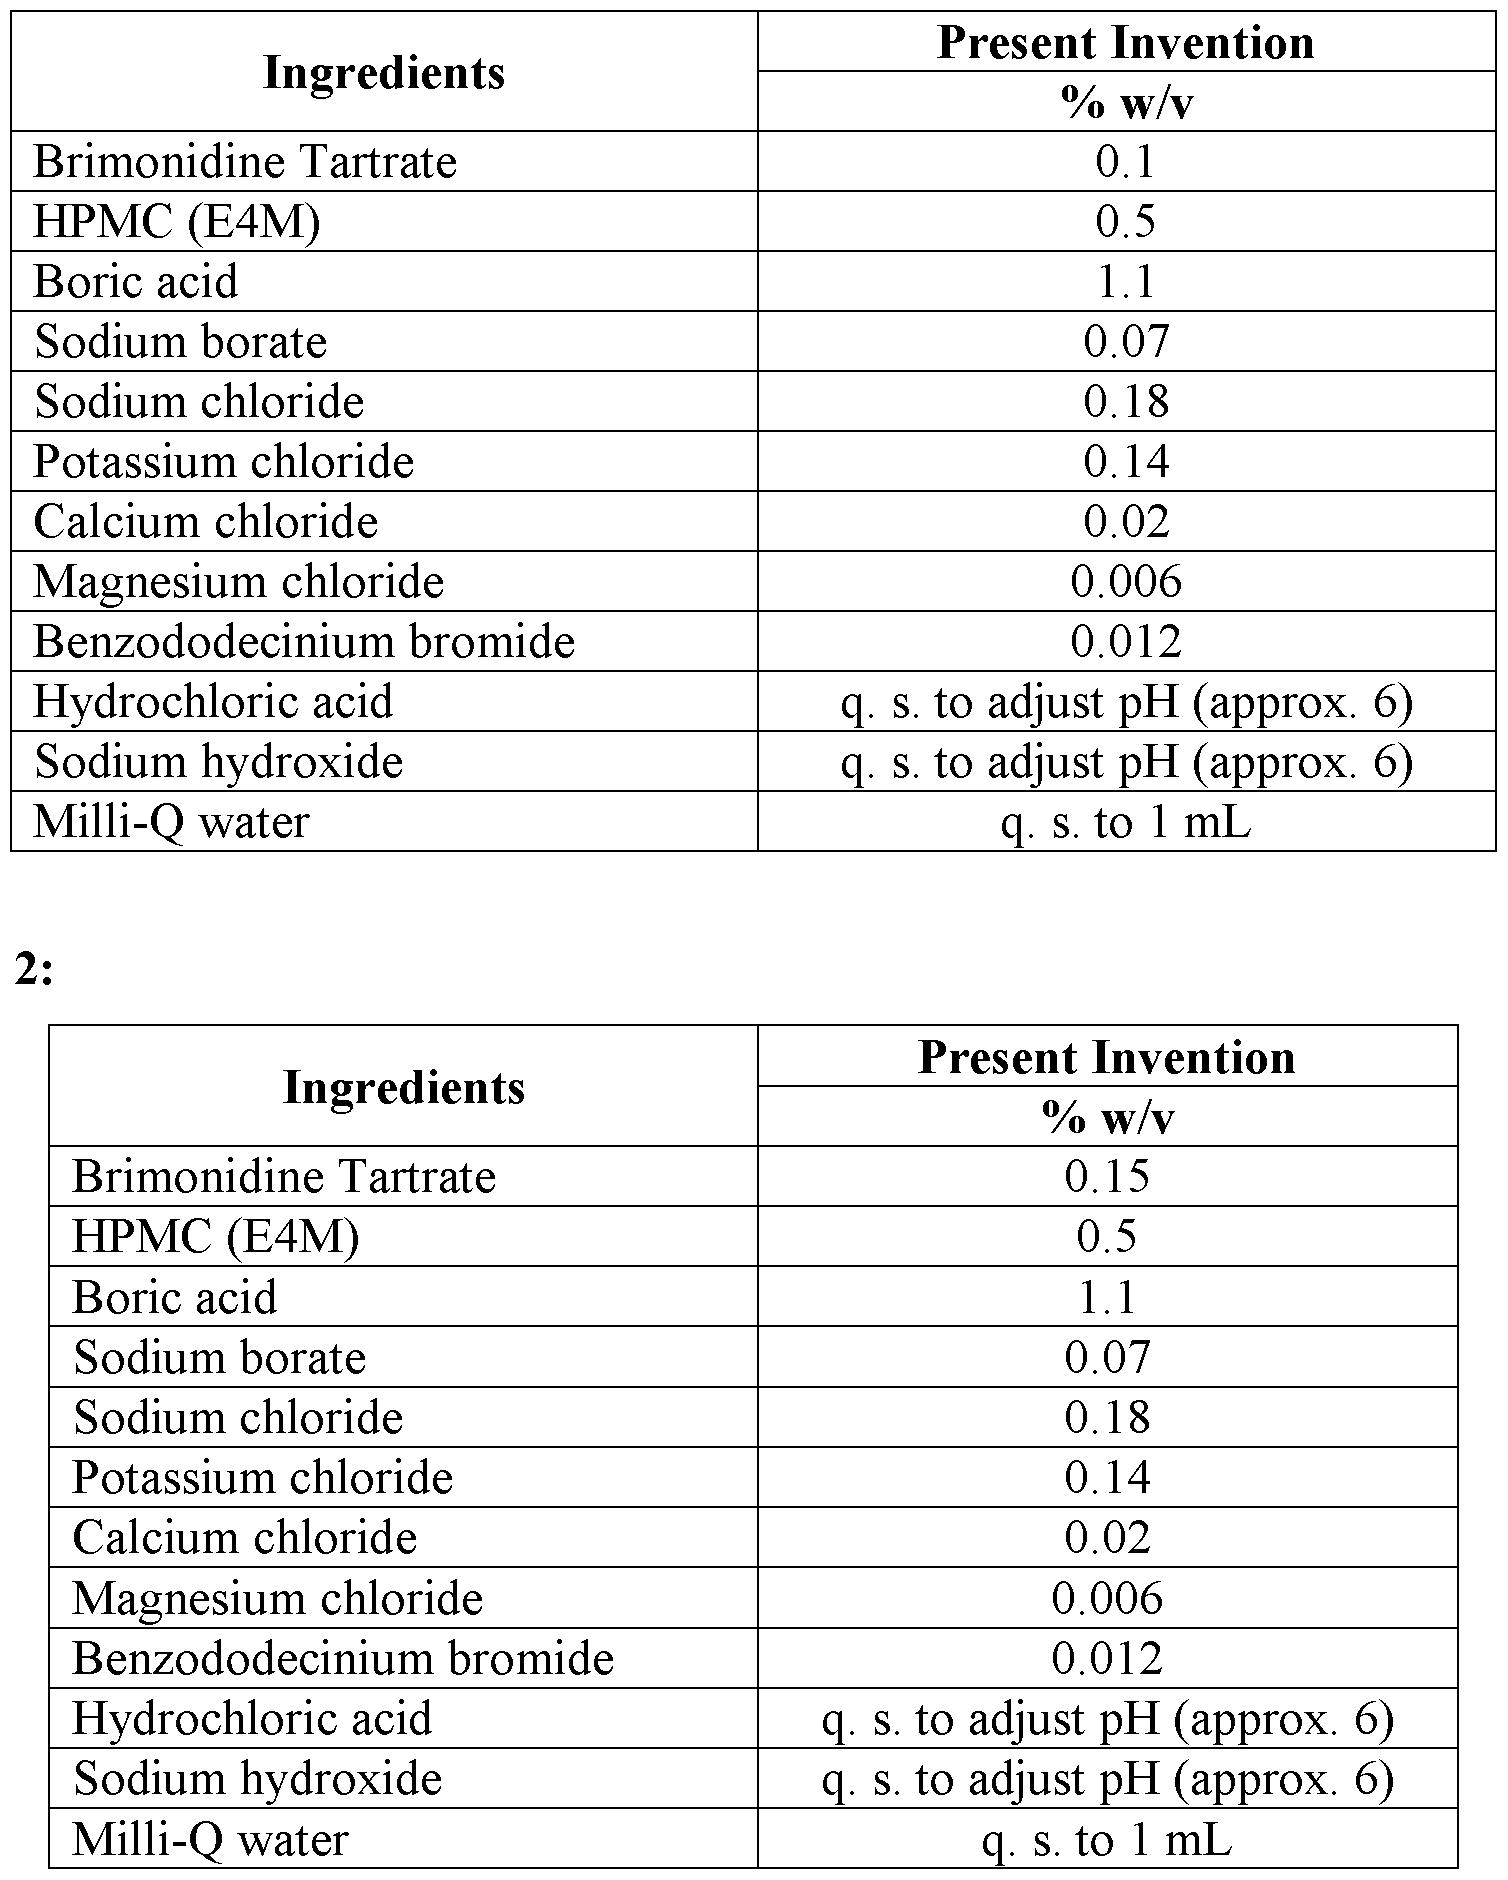 accutane dosing protocol